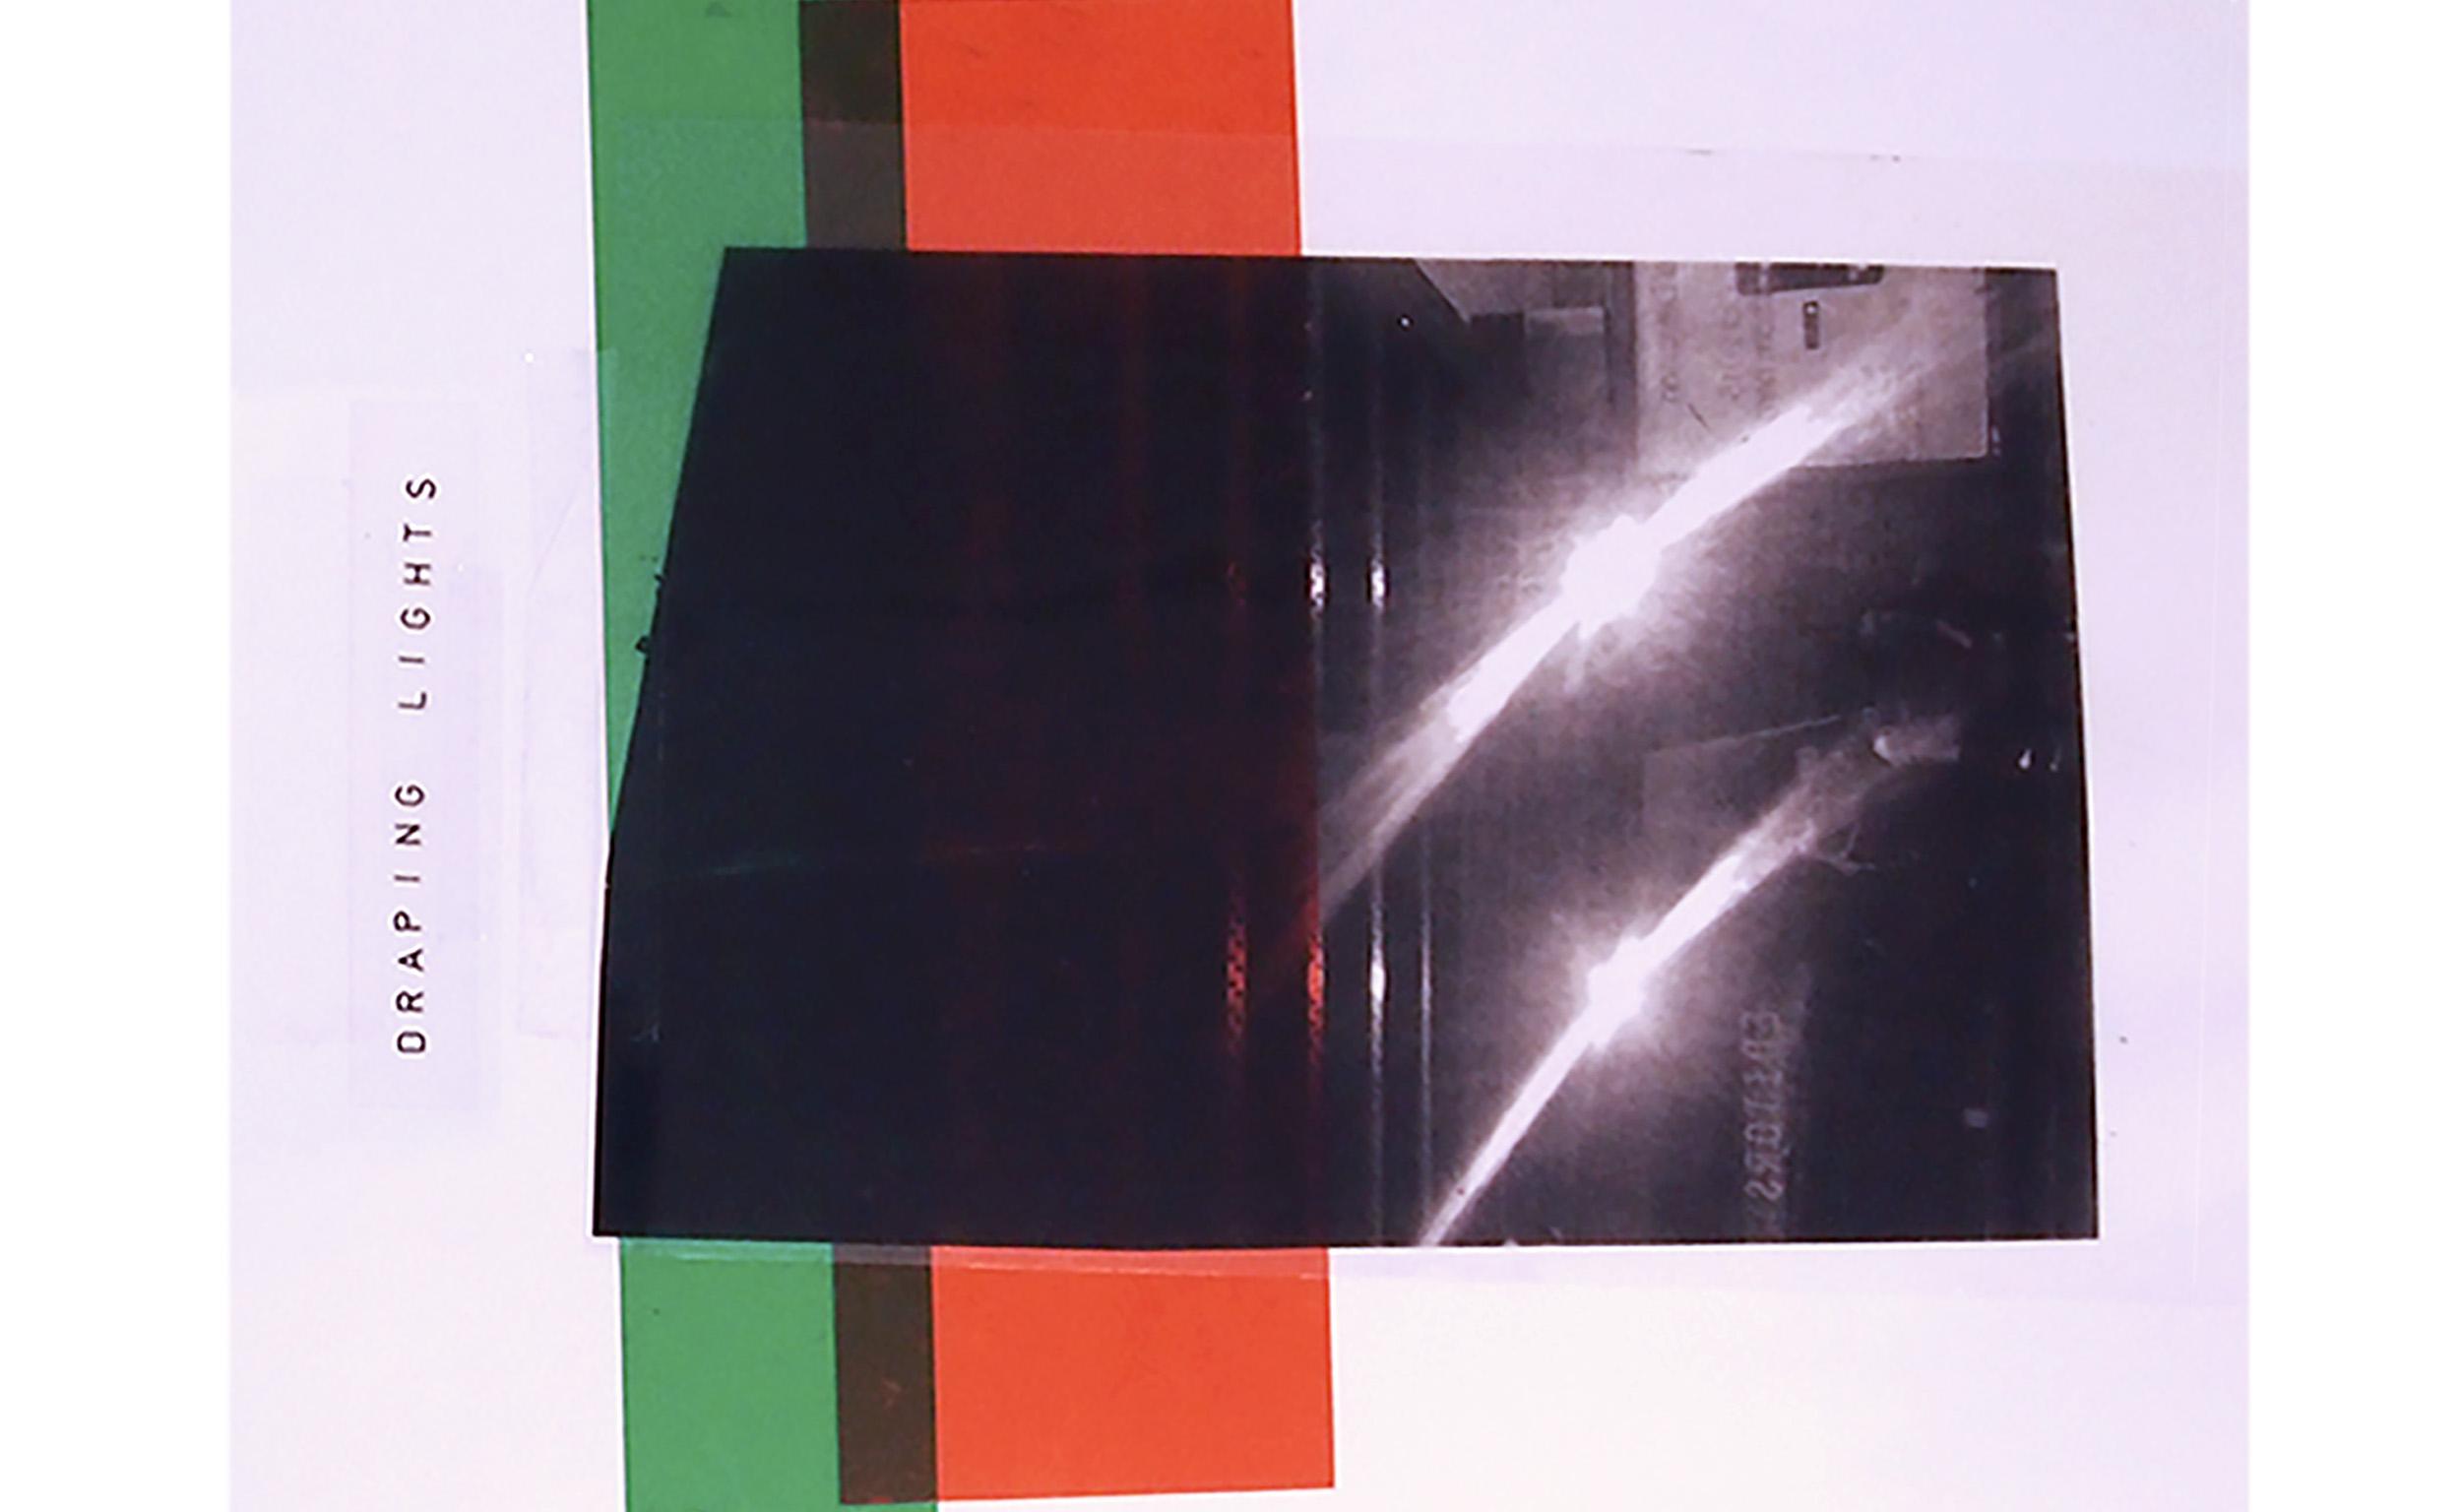 draping lights-cover2.jpg